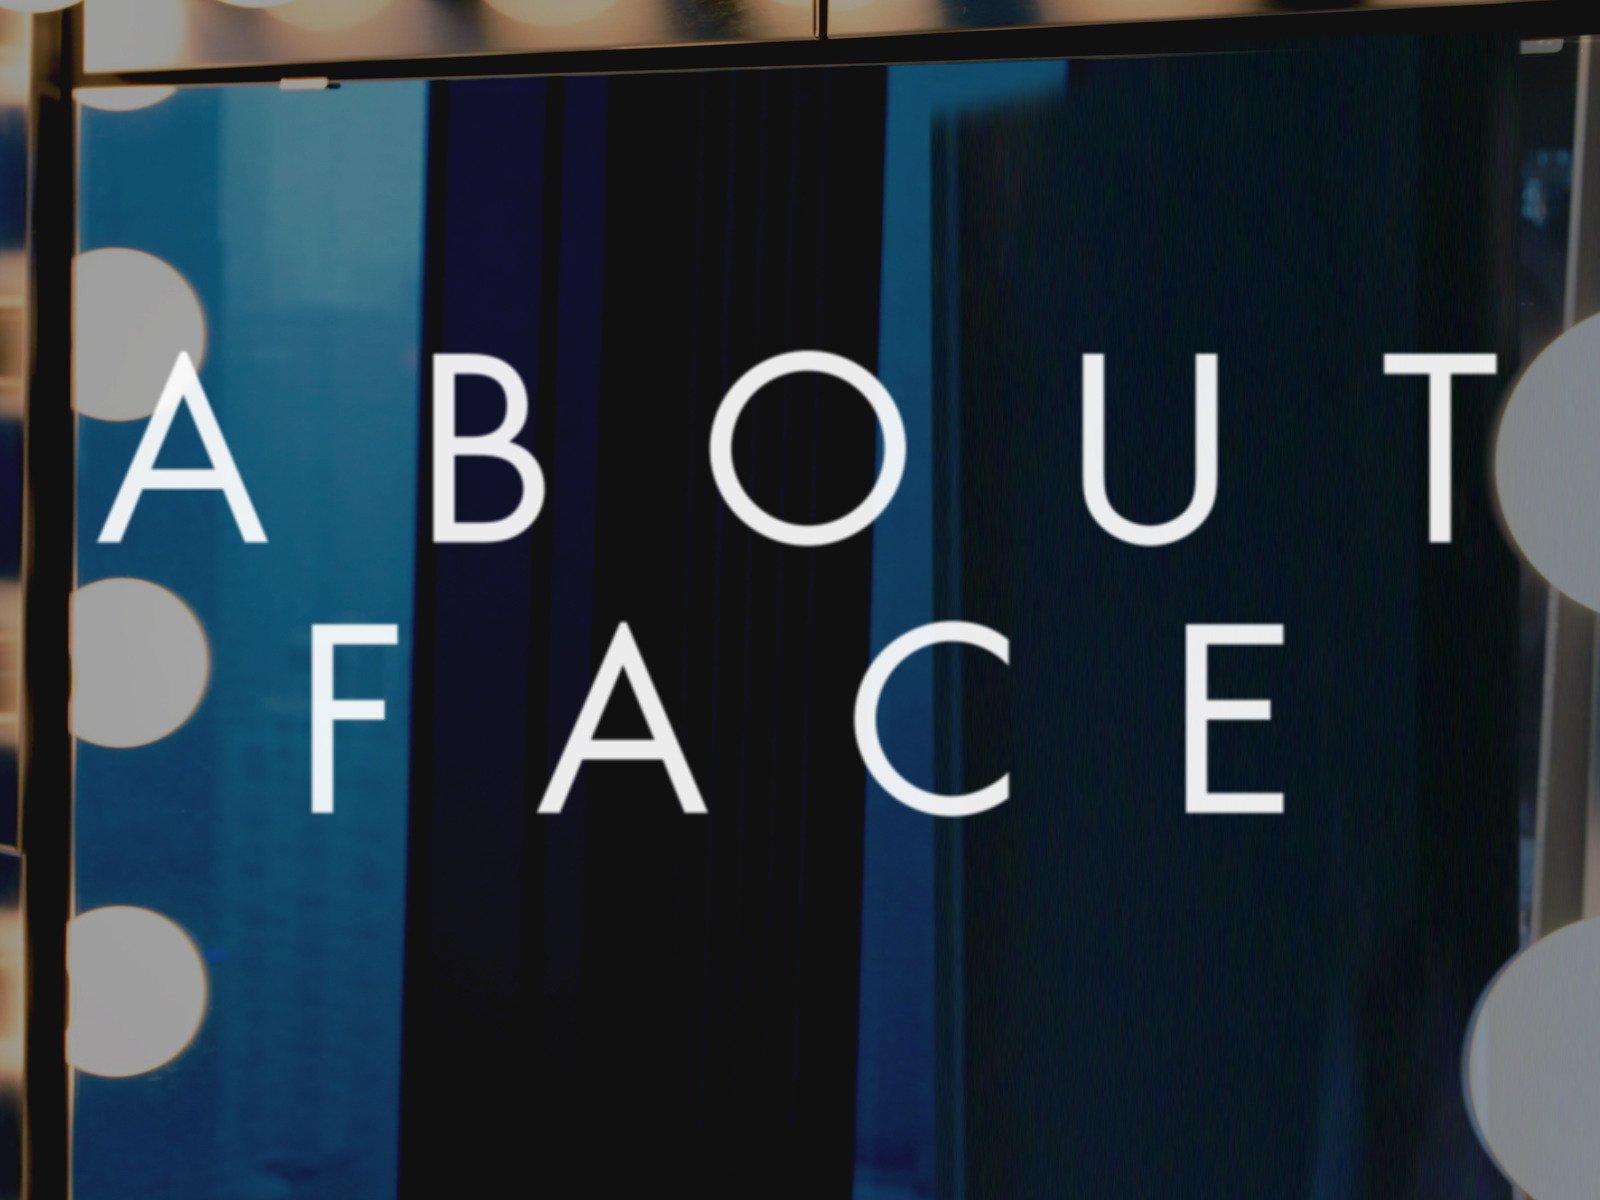 About Face - Season 1